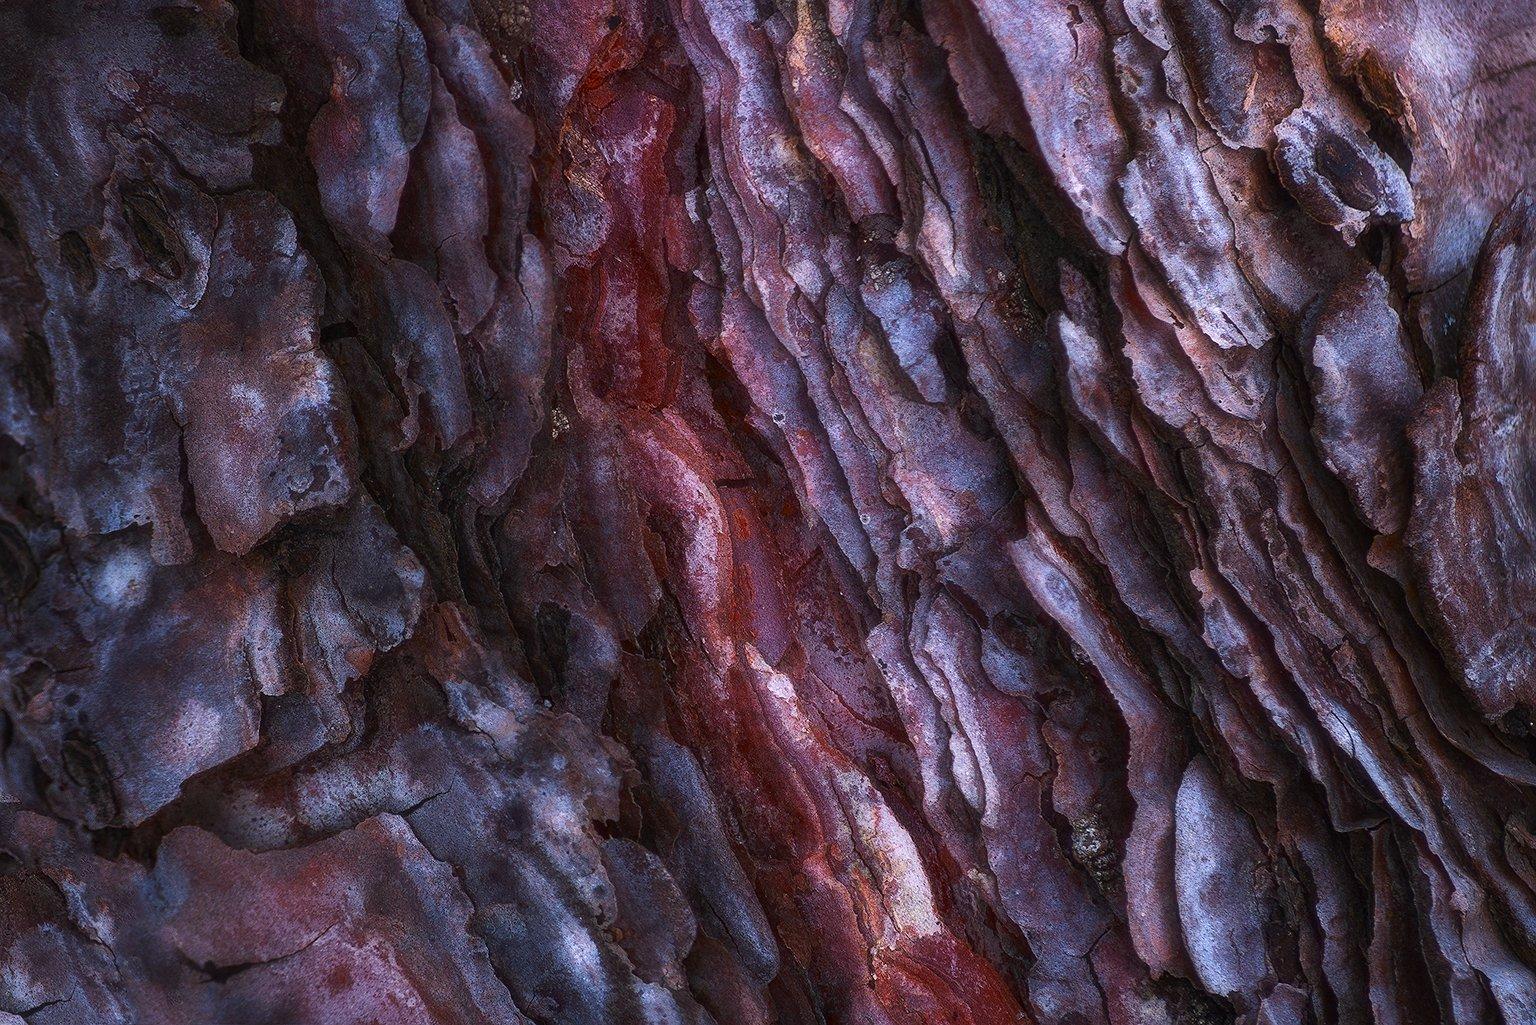 tree, bark, abstract, texture, nikon, nature, Csomai David